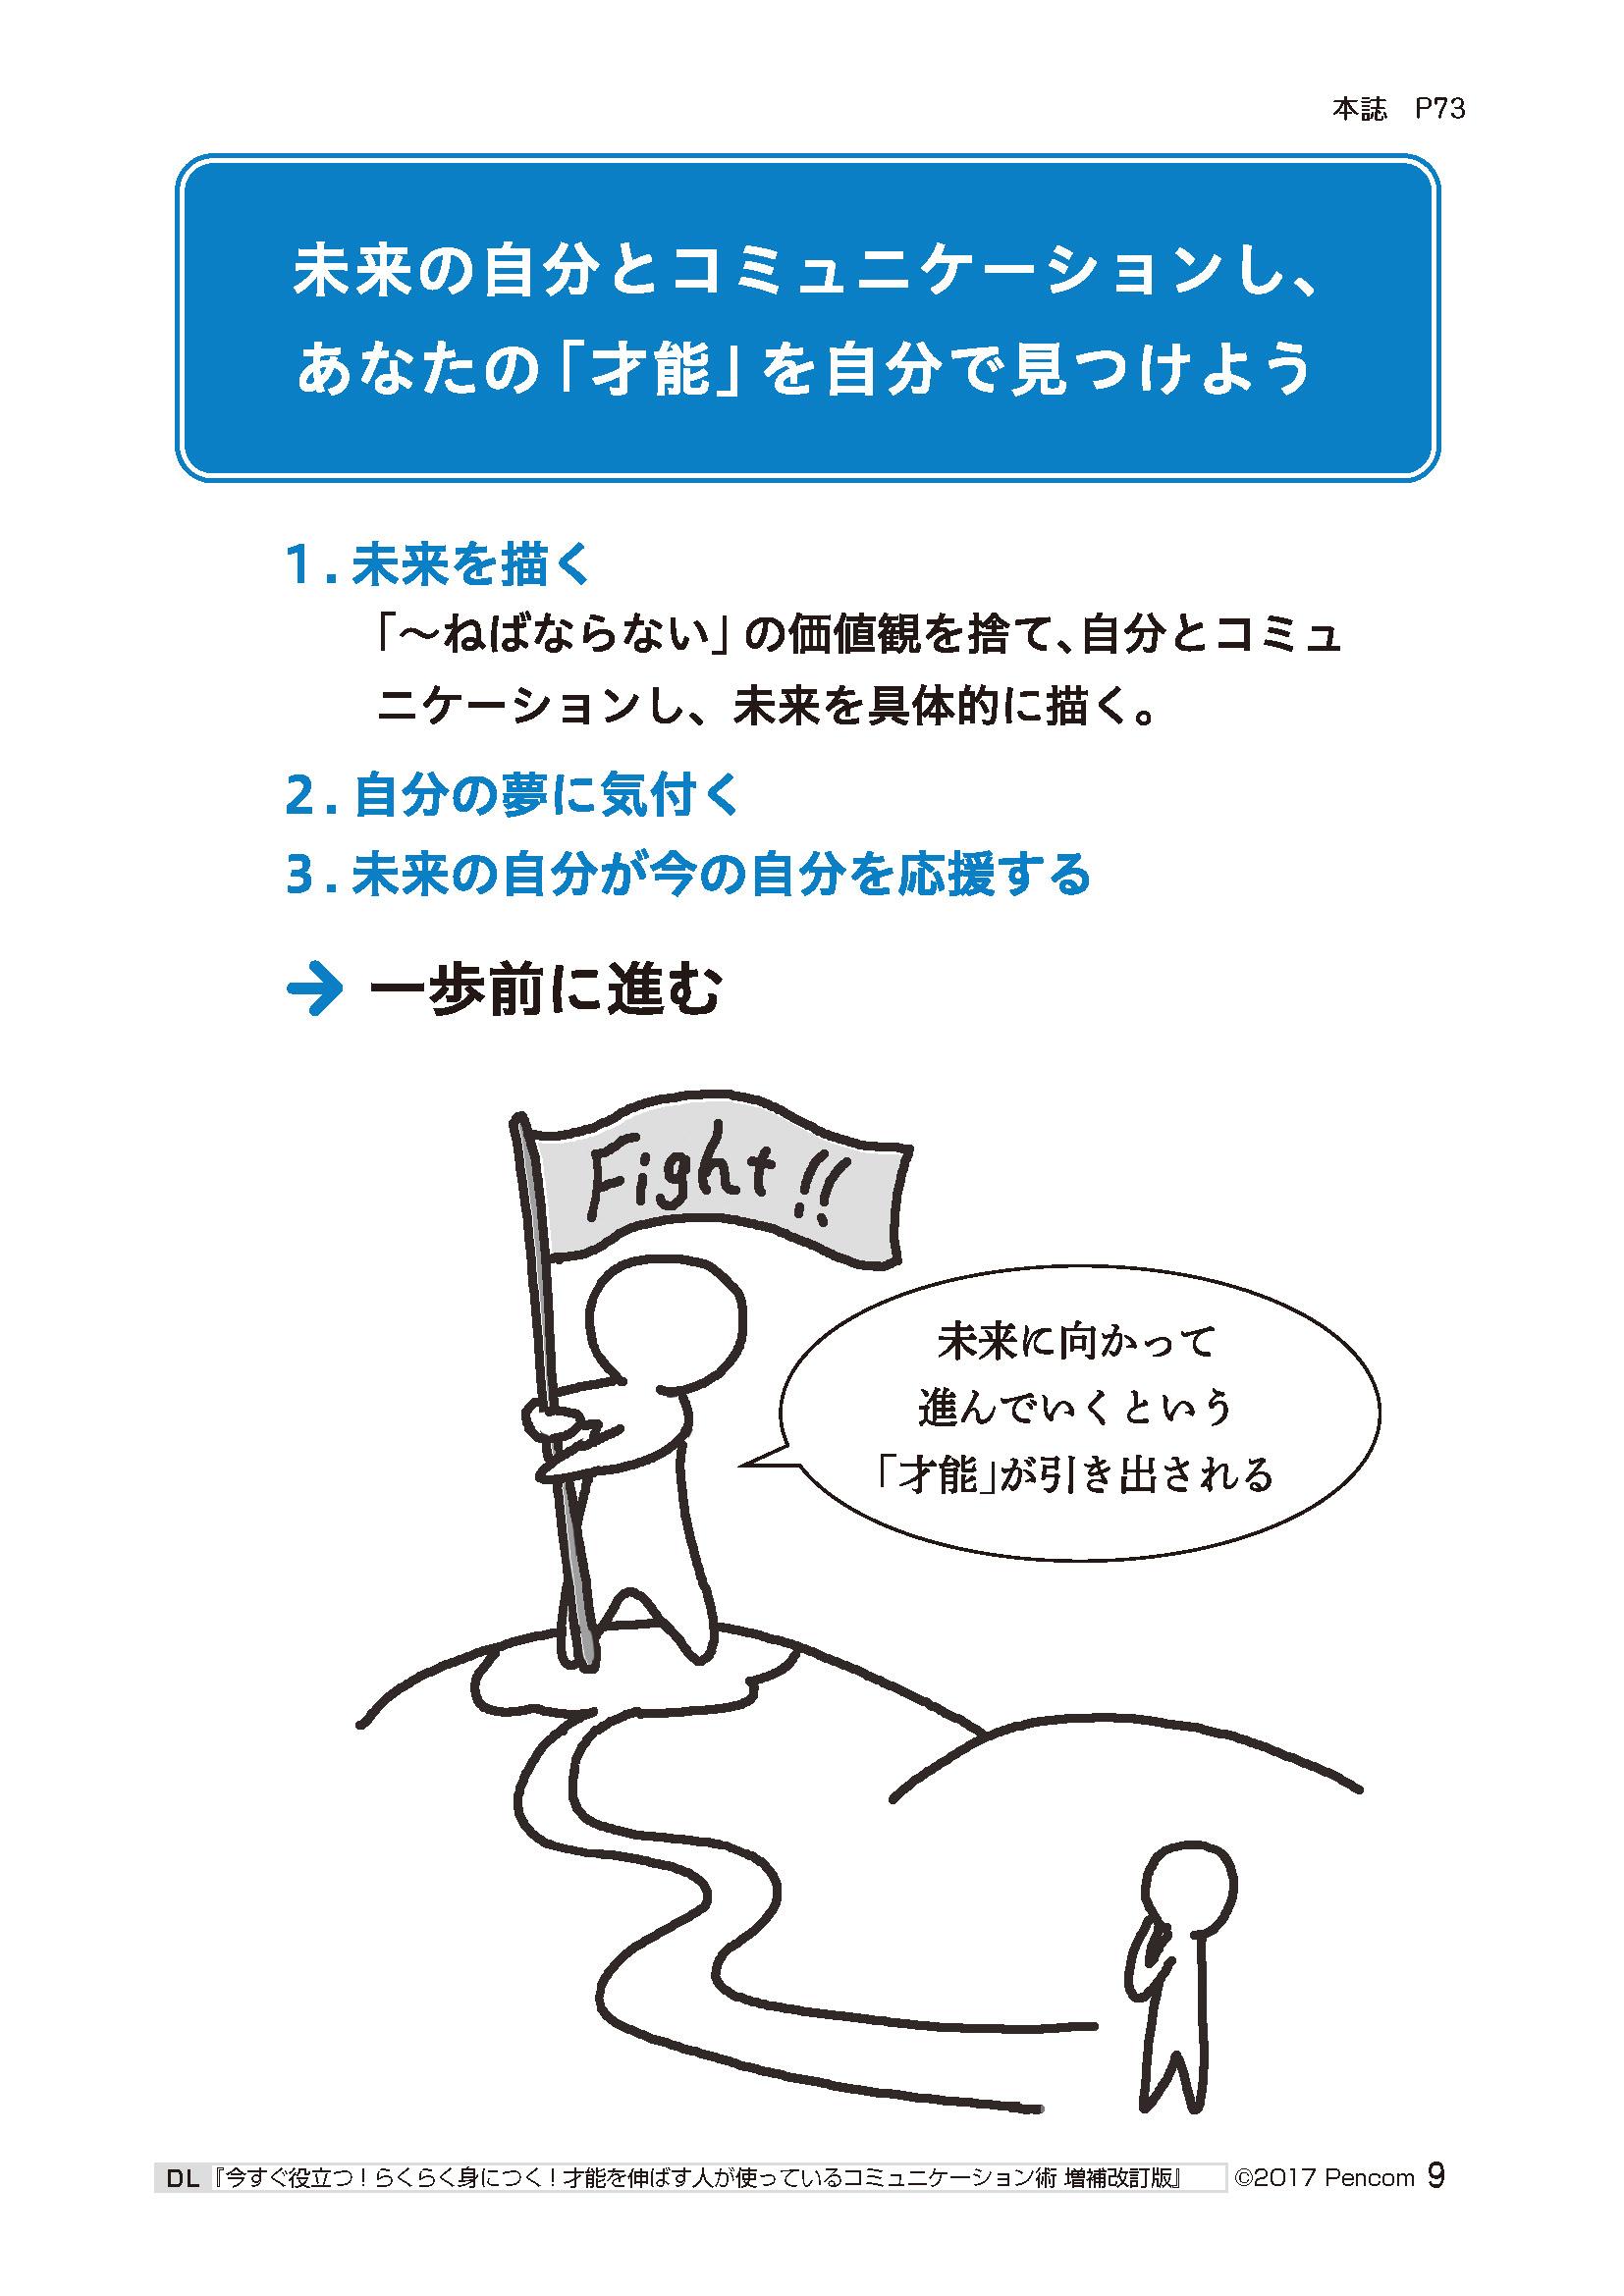 Communi File01 ページ 09